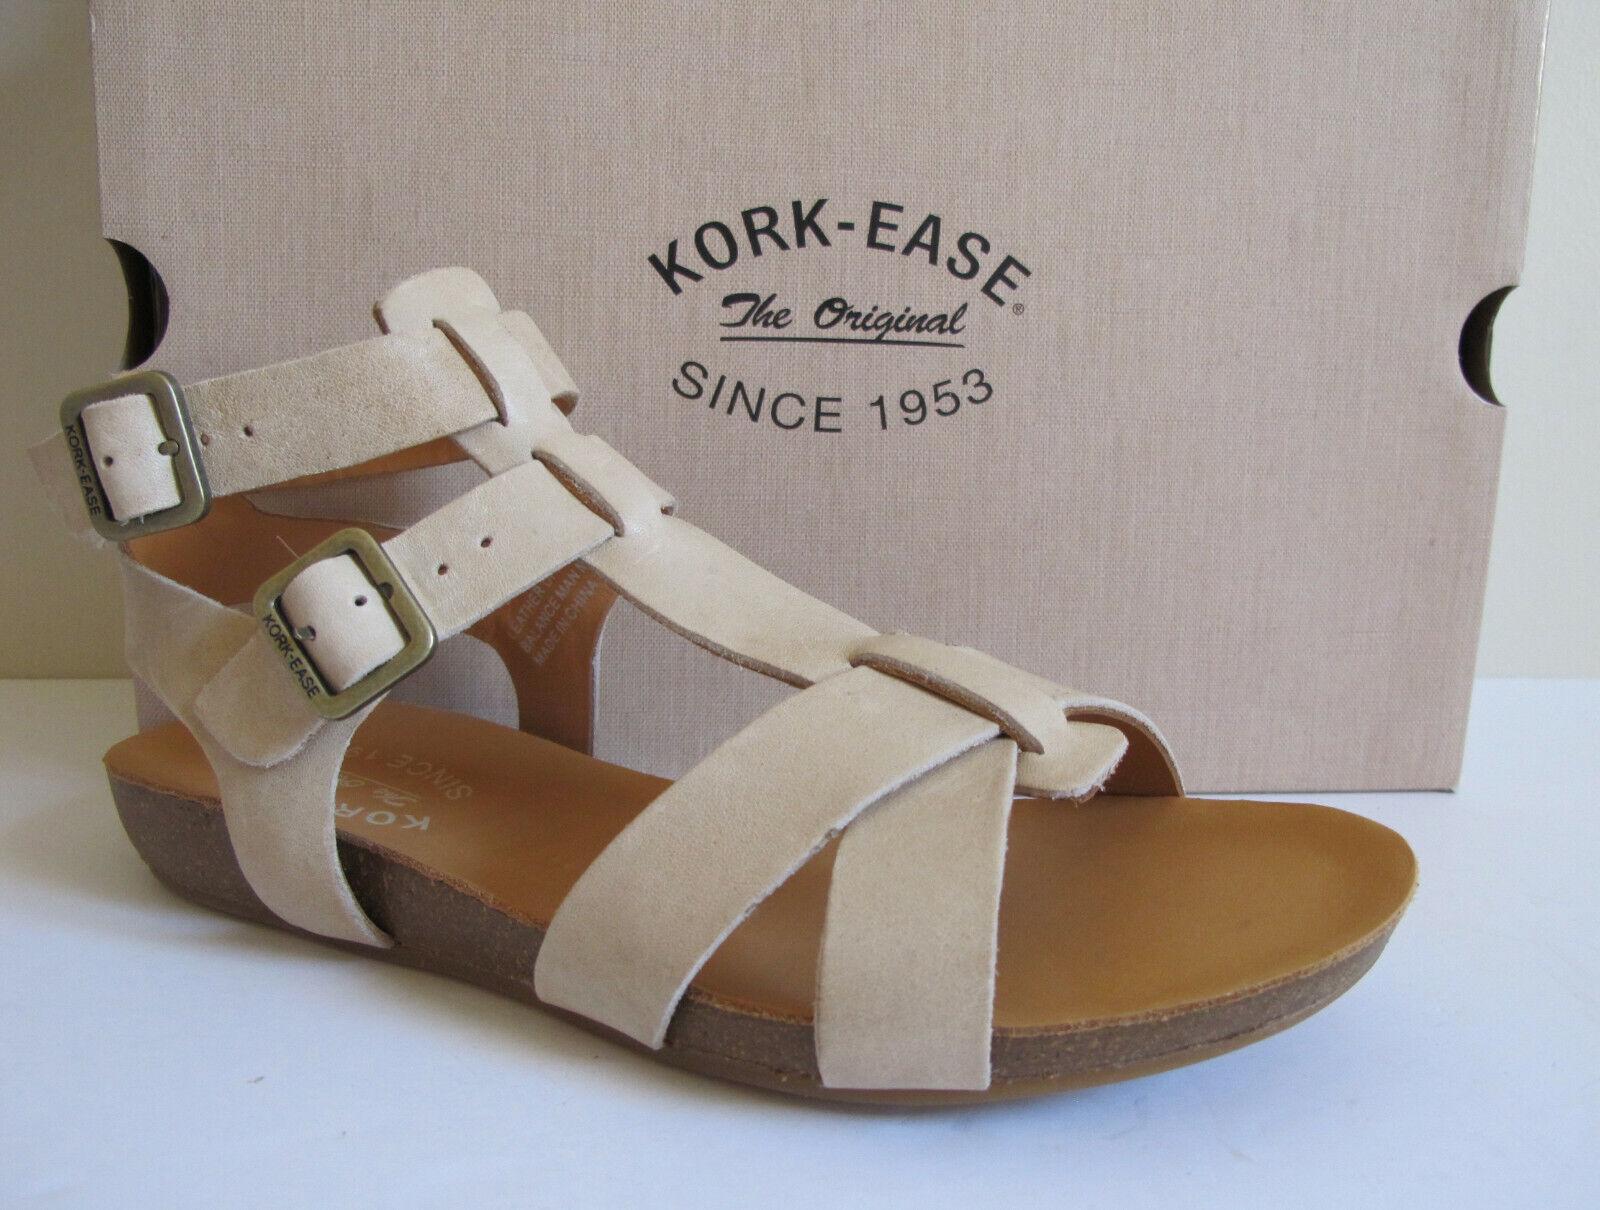 NEW NEW NEW Kork Ease Doughty Gladiator Natural Leather Sandal 7 U.S., EUR 38 New In Box 0e9102